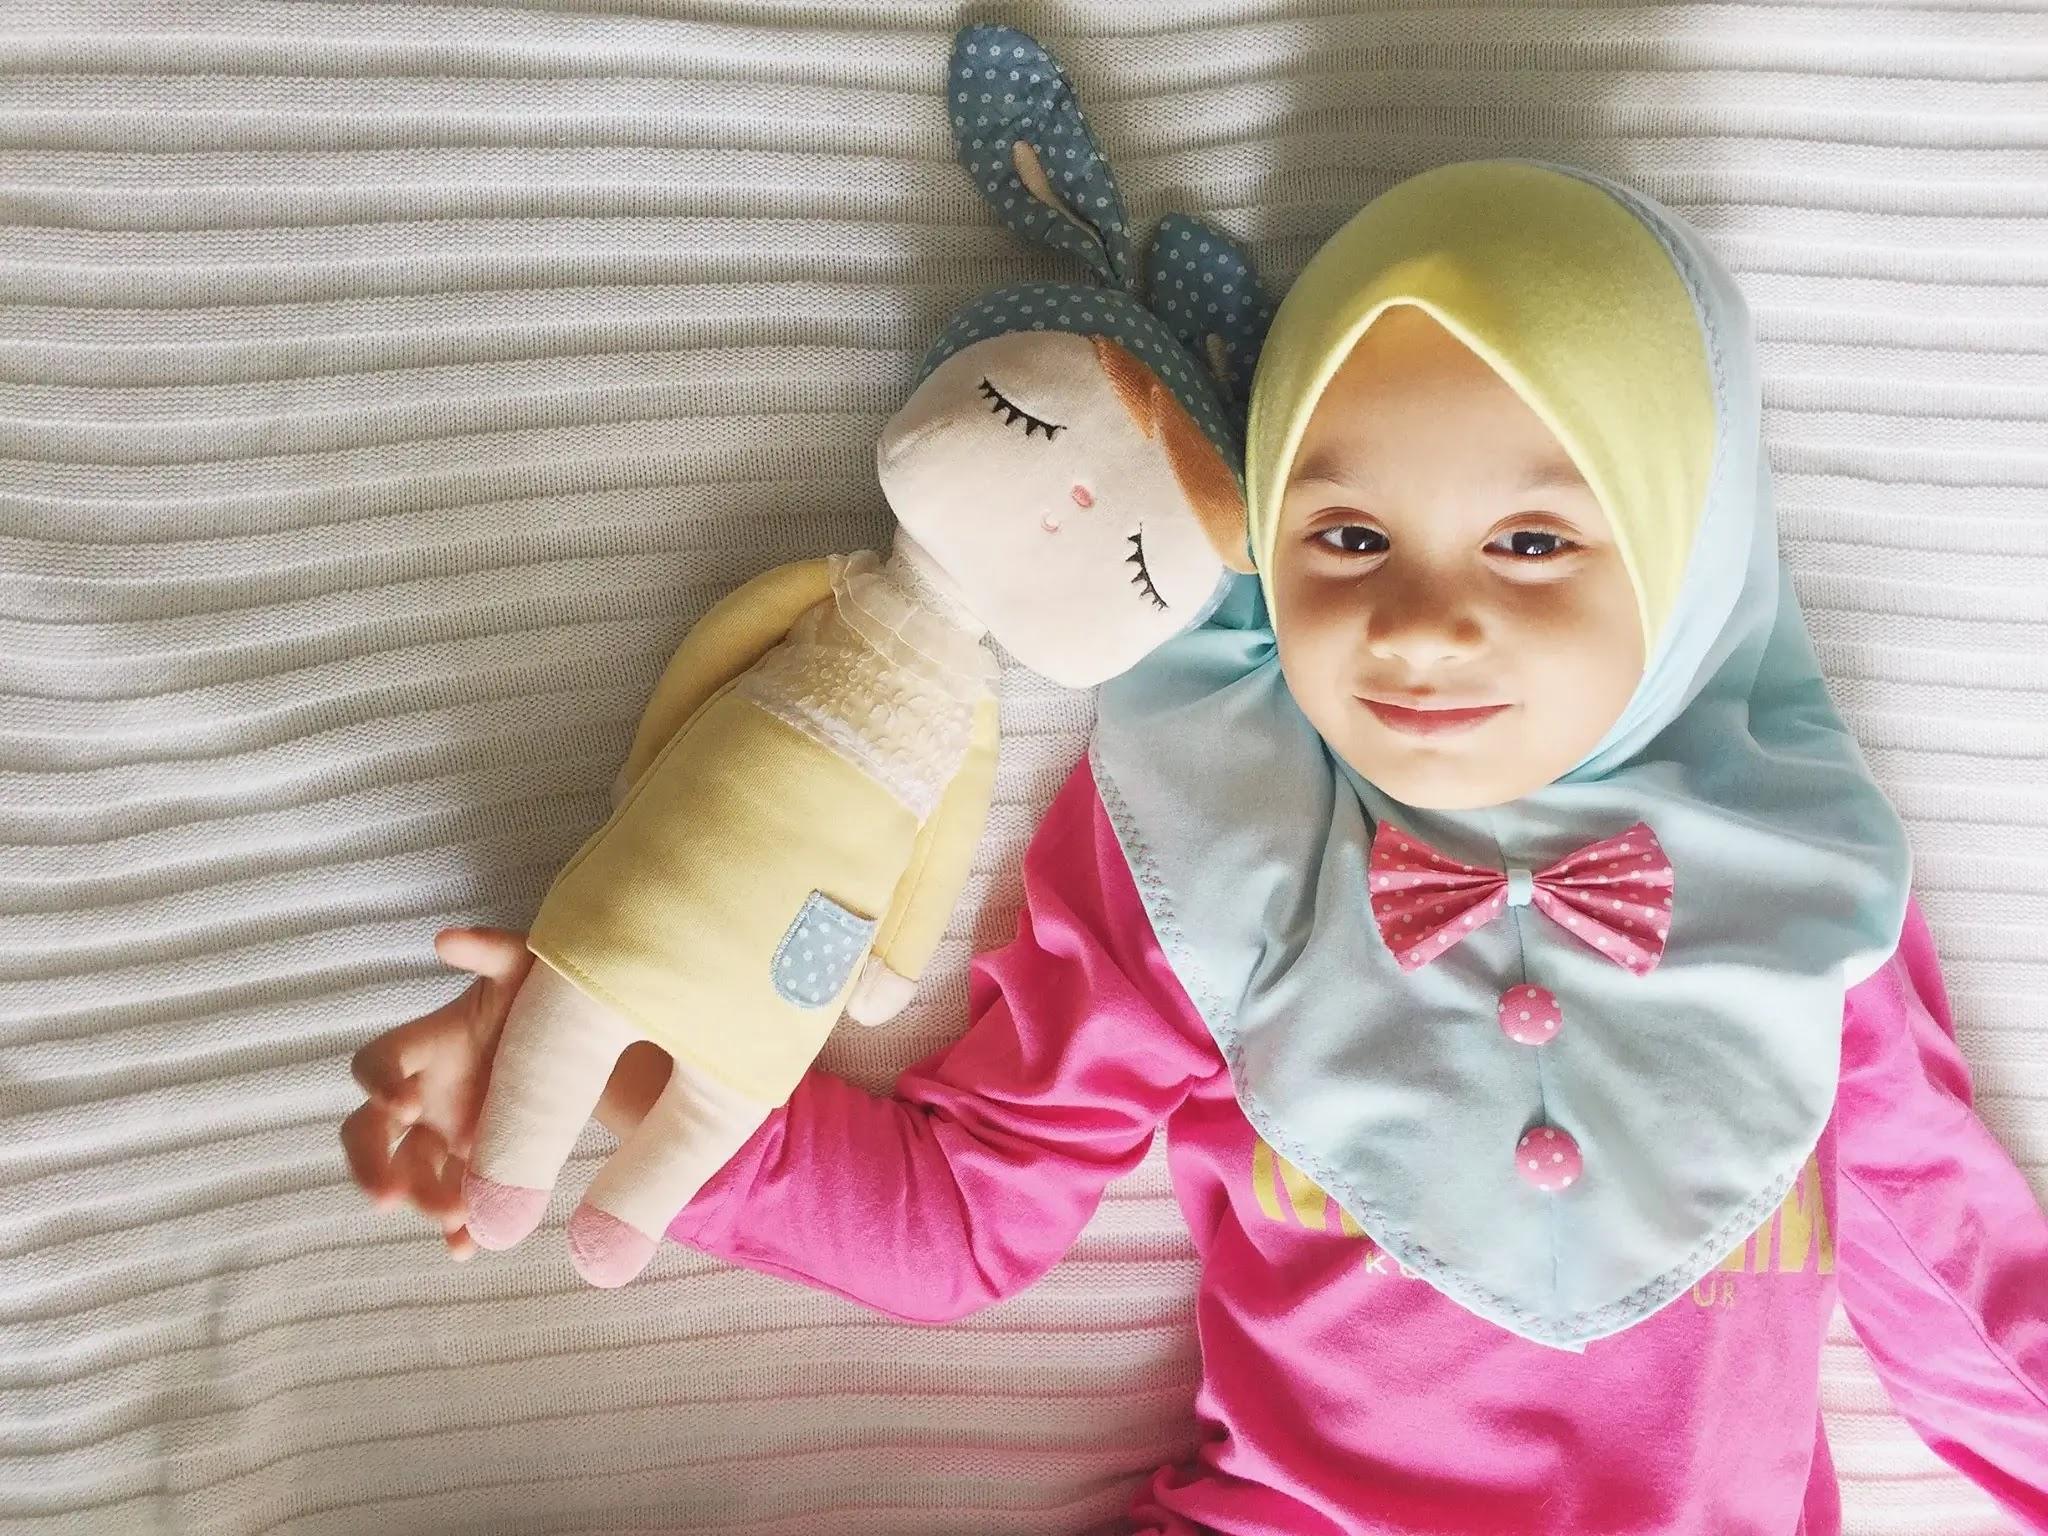 Fathiyah dreams tudung kanak kanak naelofar